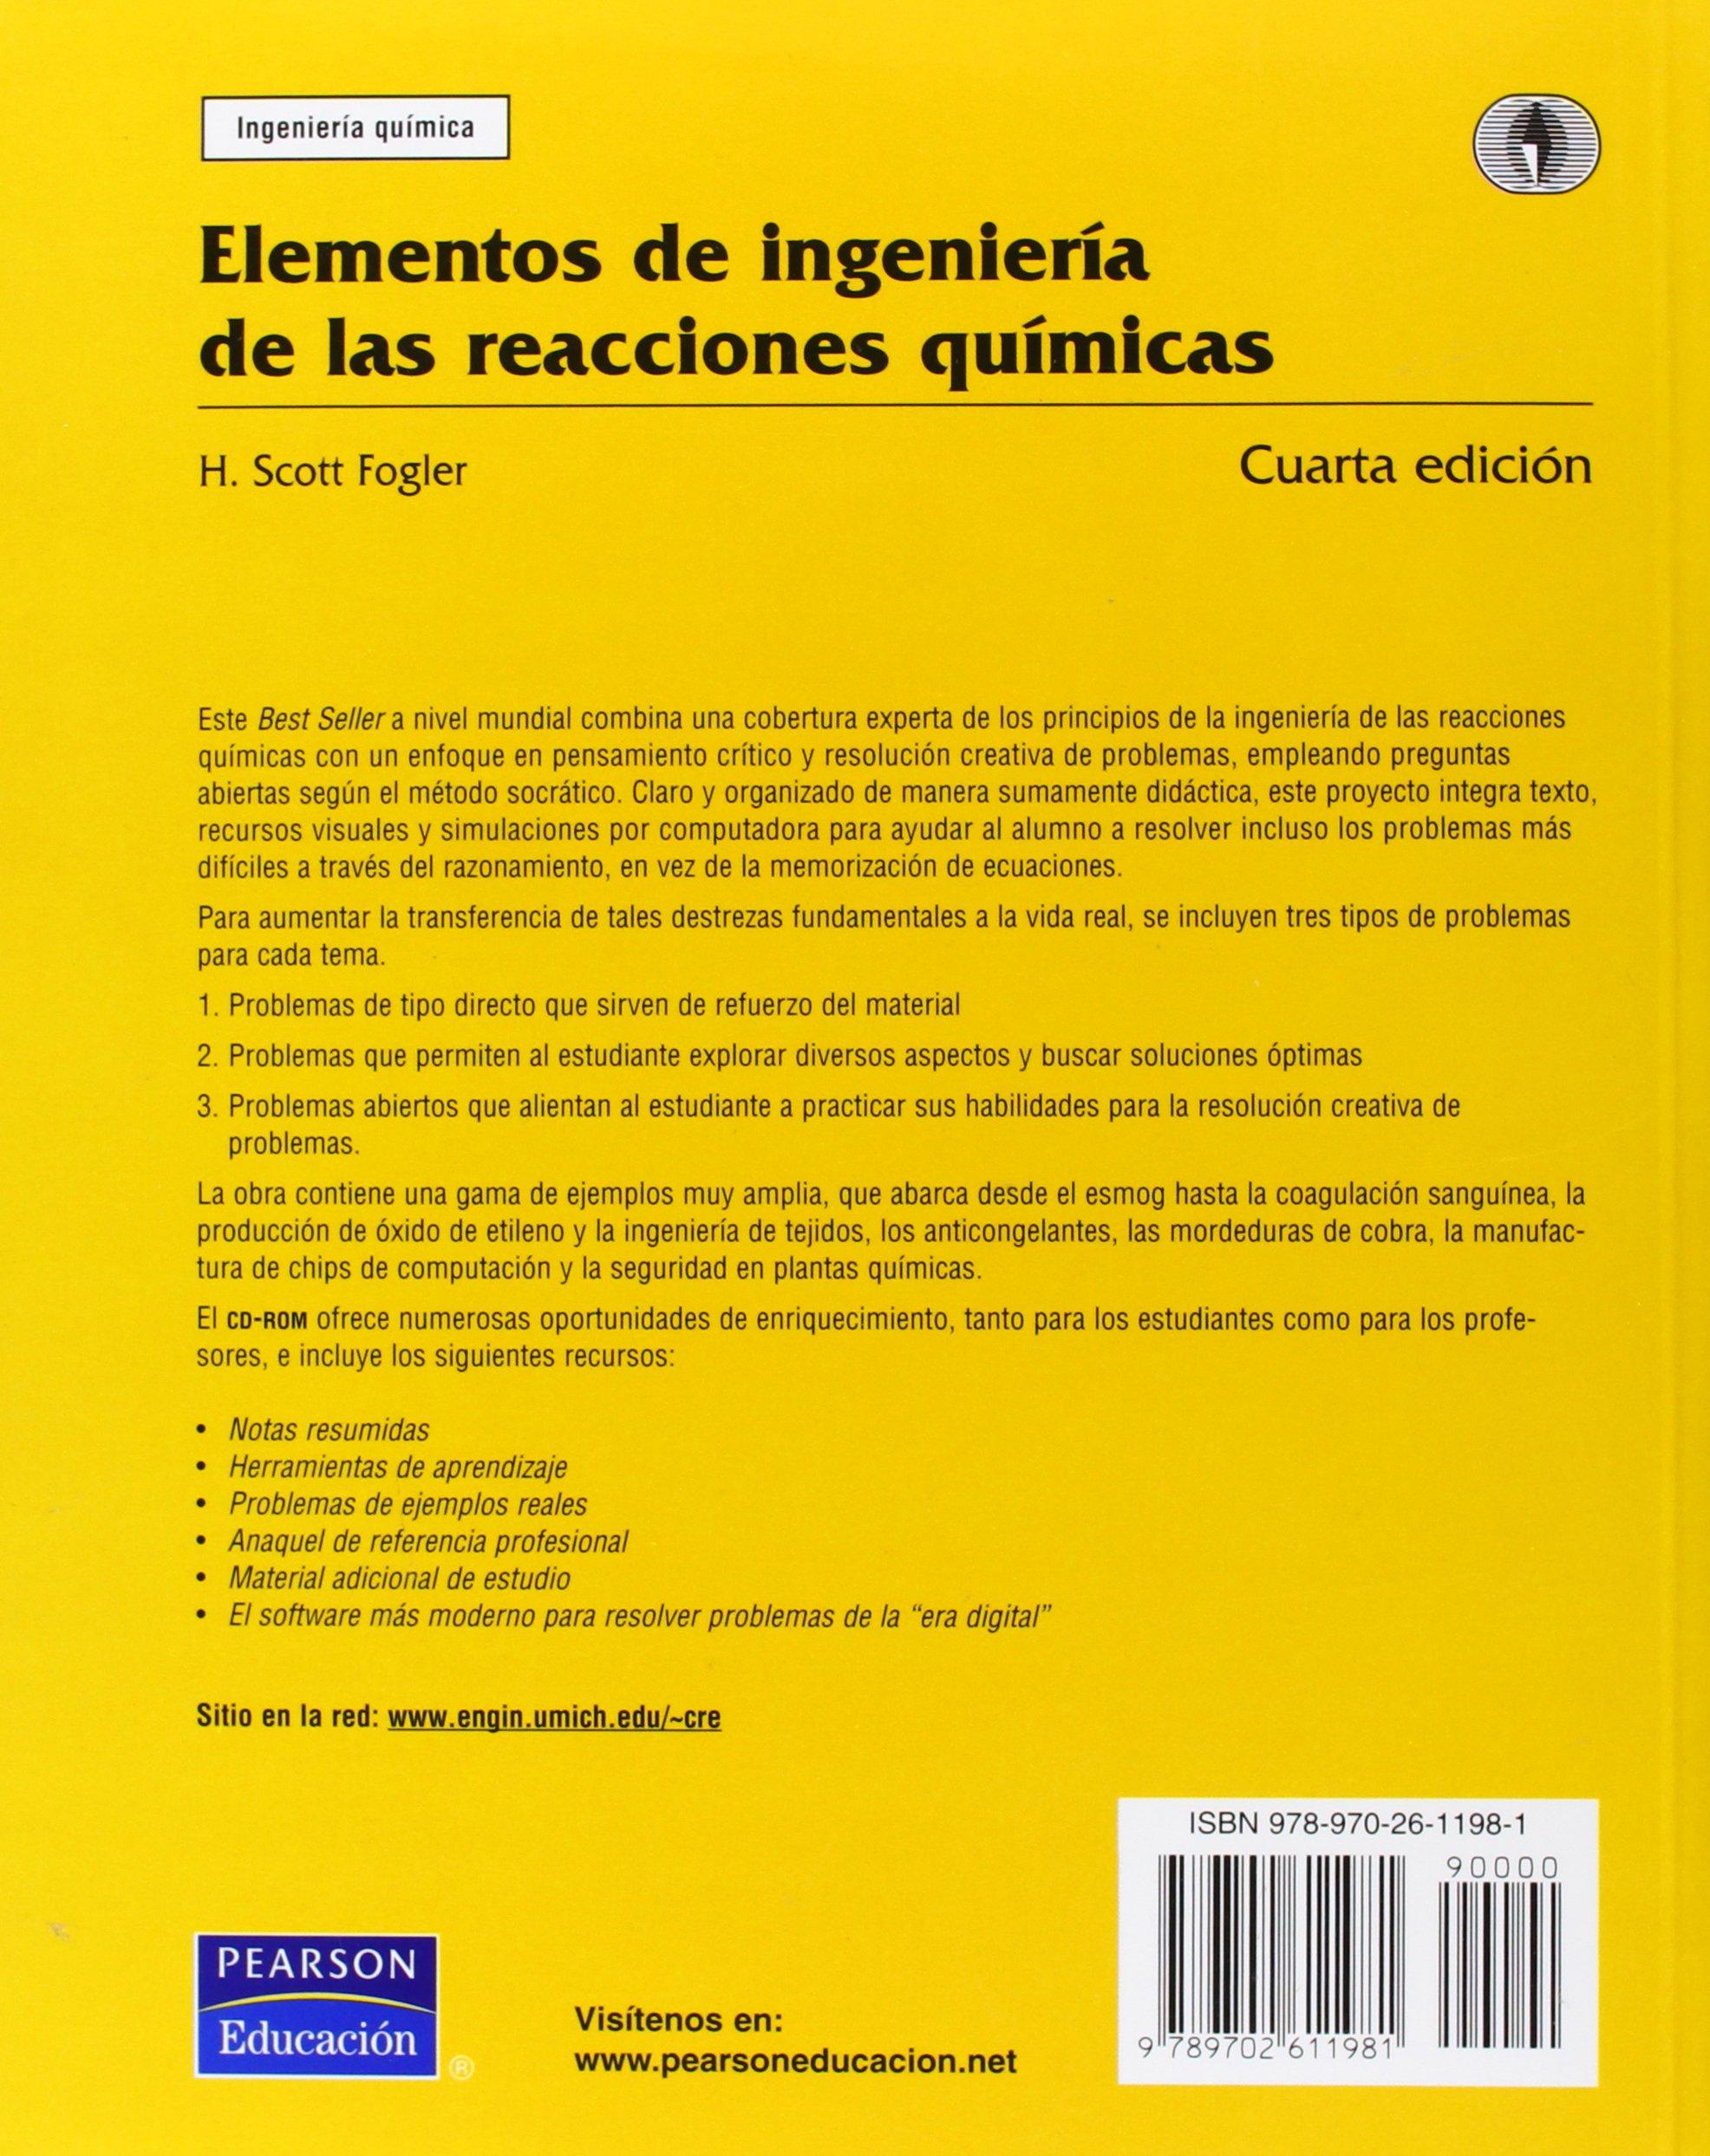 Elementos de ingenieria de las reacciones quimicas c 2 cds scott h fogler amazon com mx libros